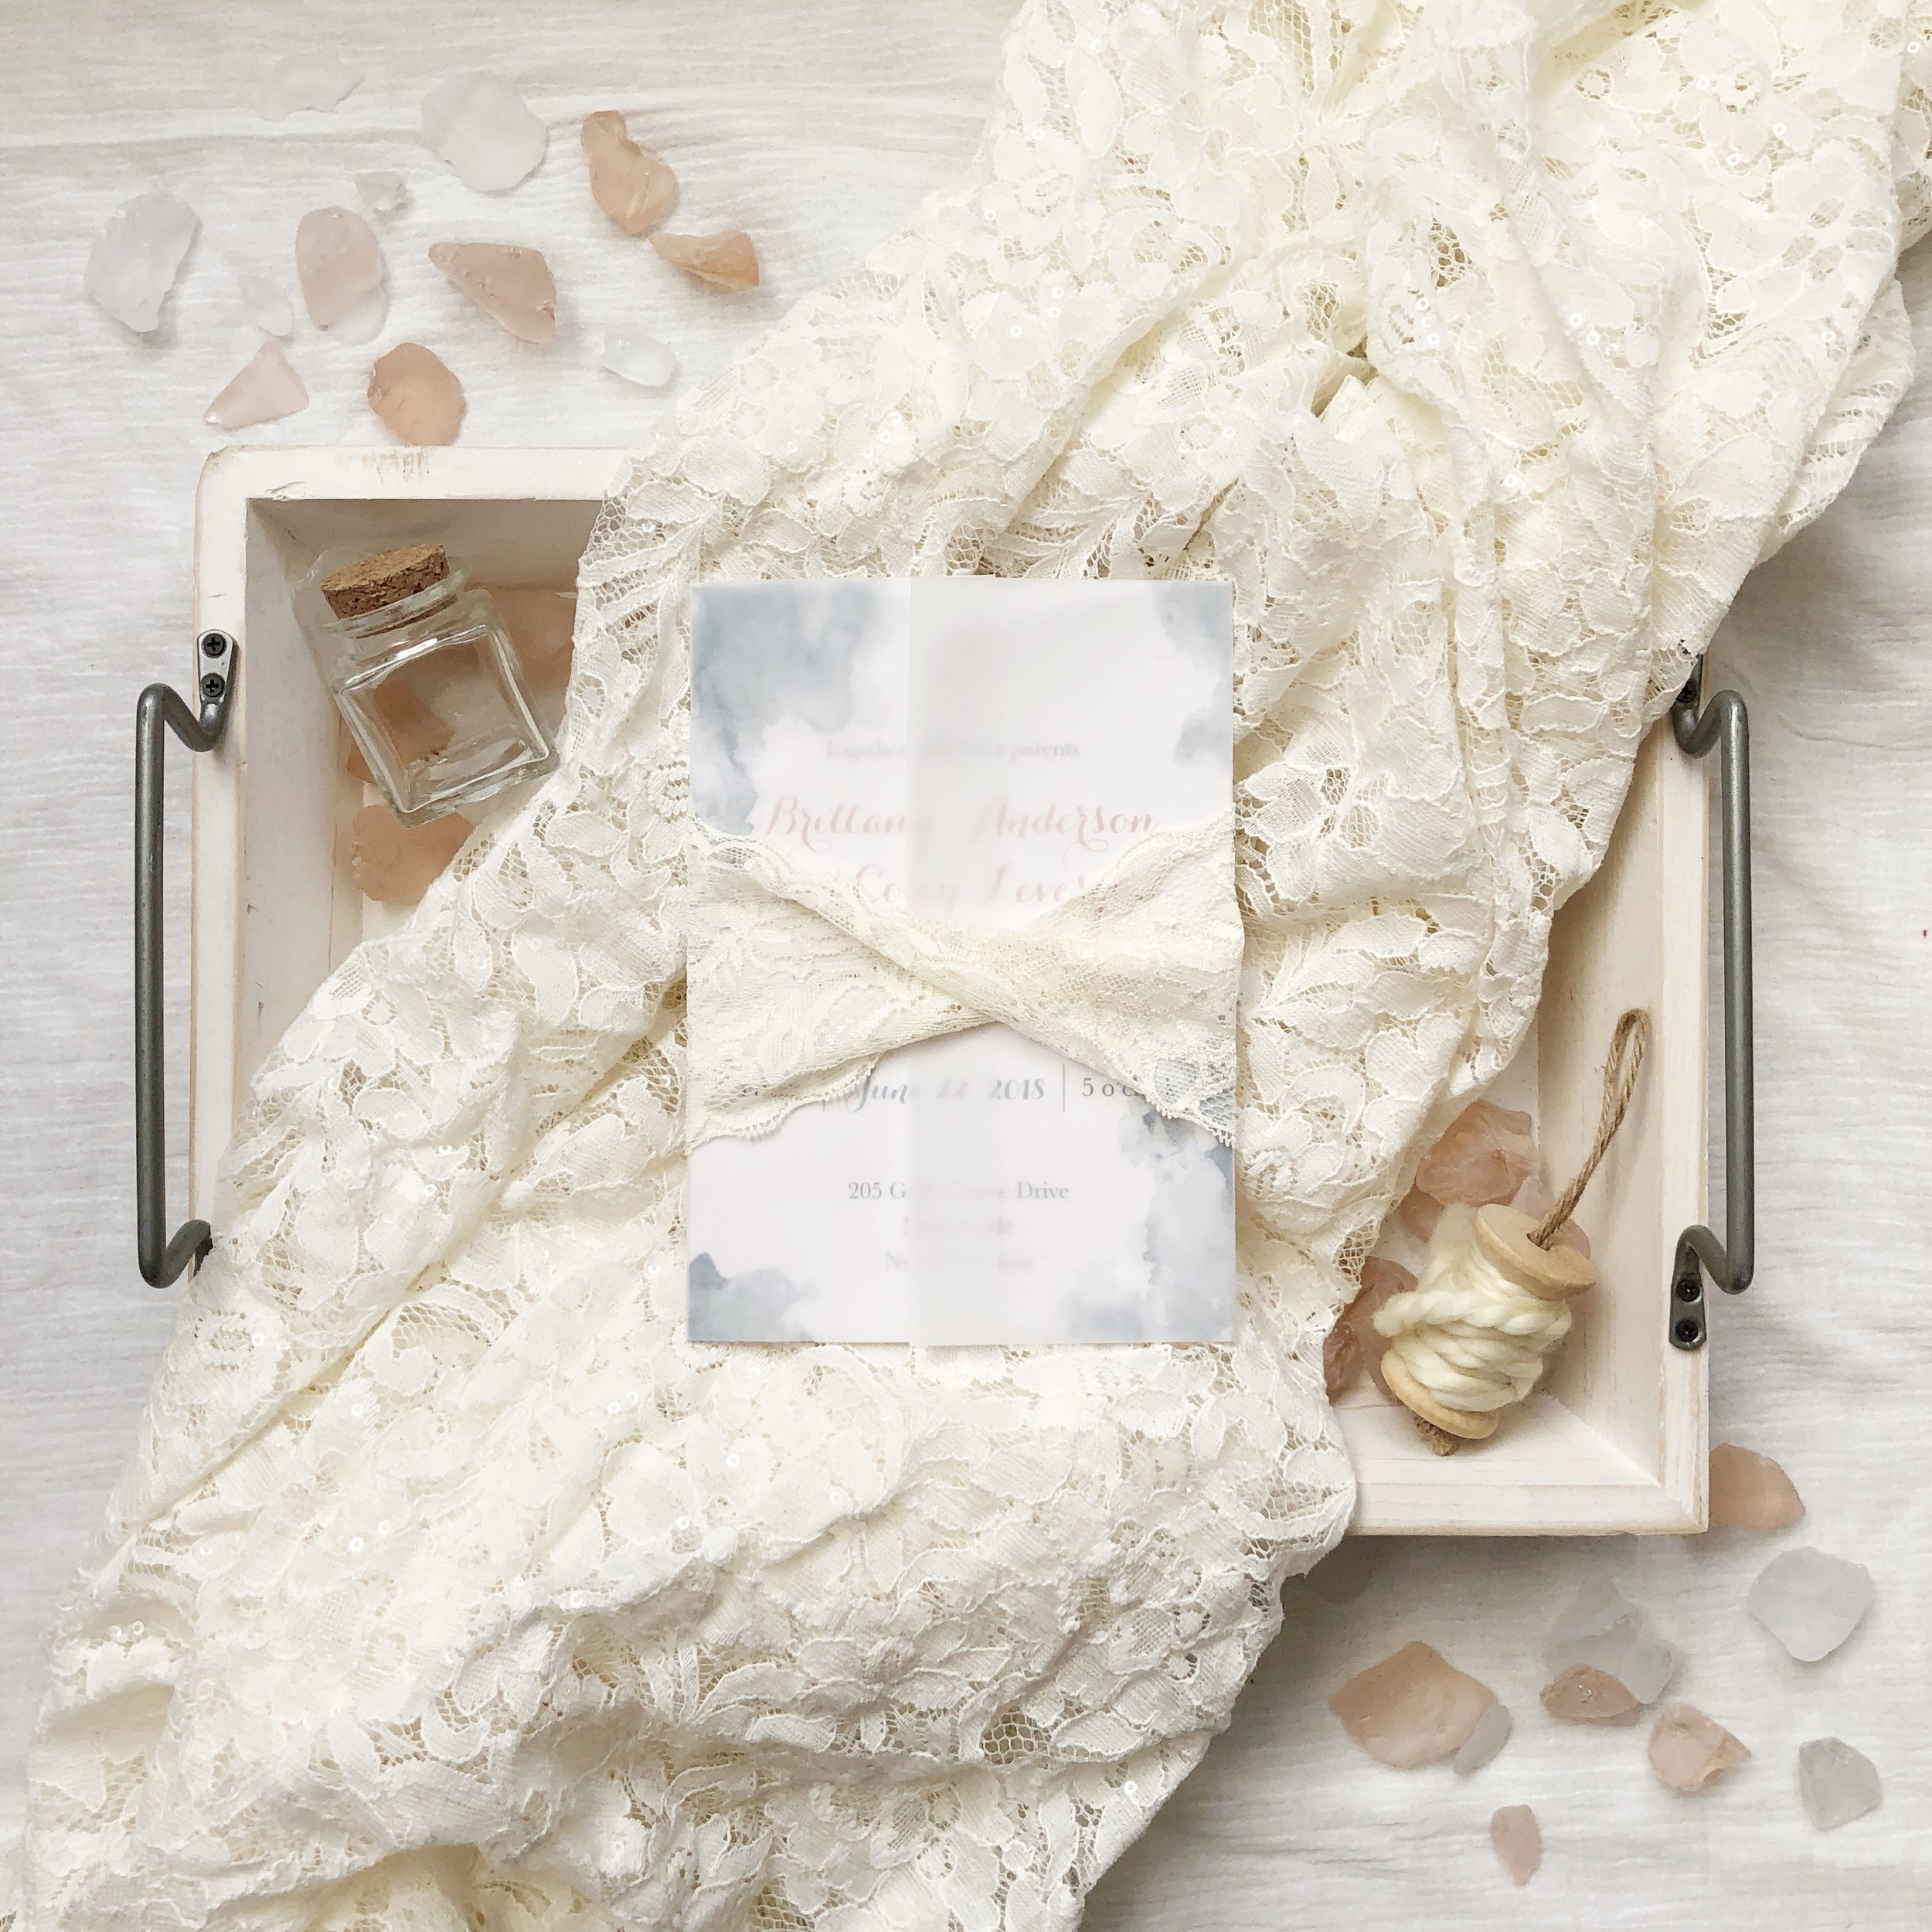 Central PA, York PA, JesSmith Designs, custom, wedding, invitations, bridal, announcements, save the date, baby, hanover, calligraphy, baltimore, wedding invitations, lancaster, gettysburg-01-01 15.49.28.jpg